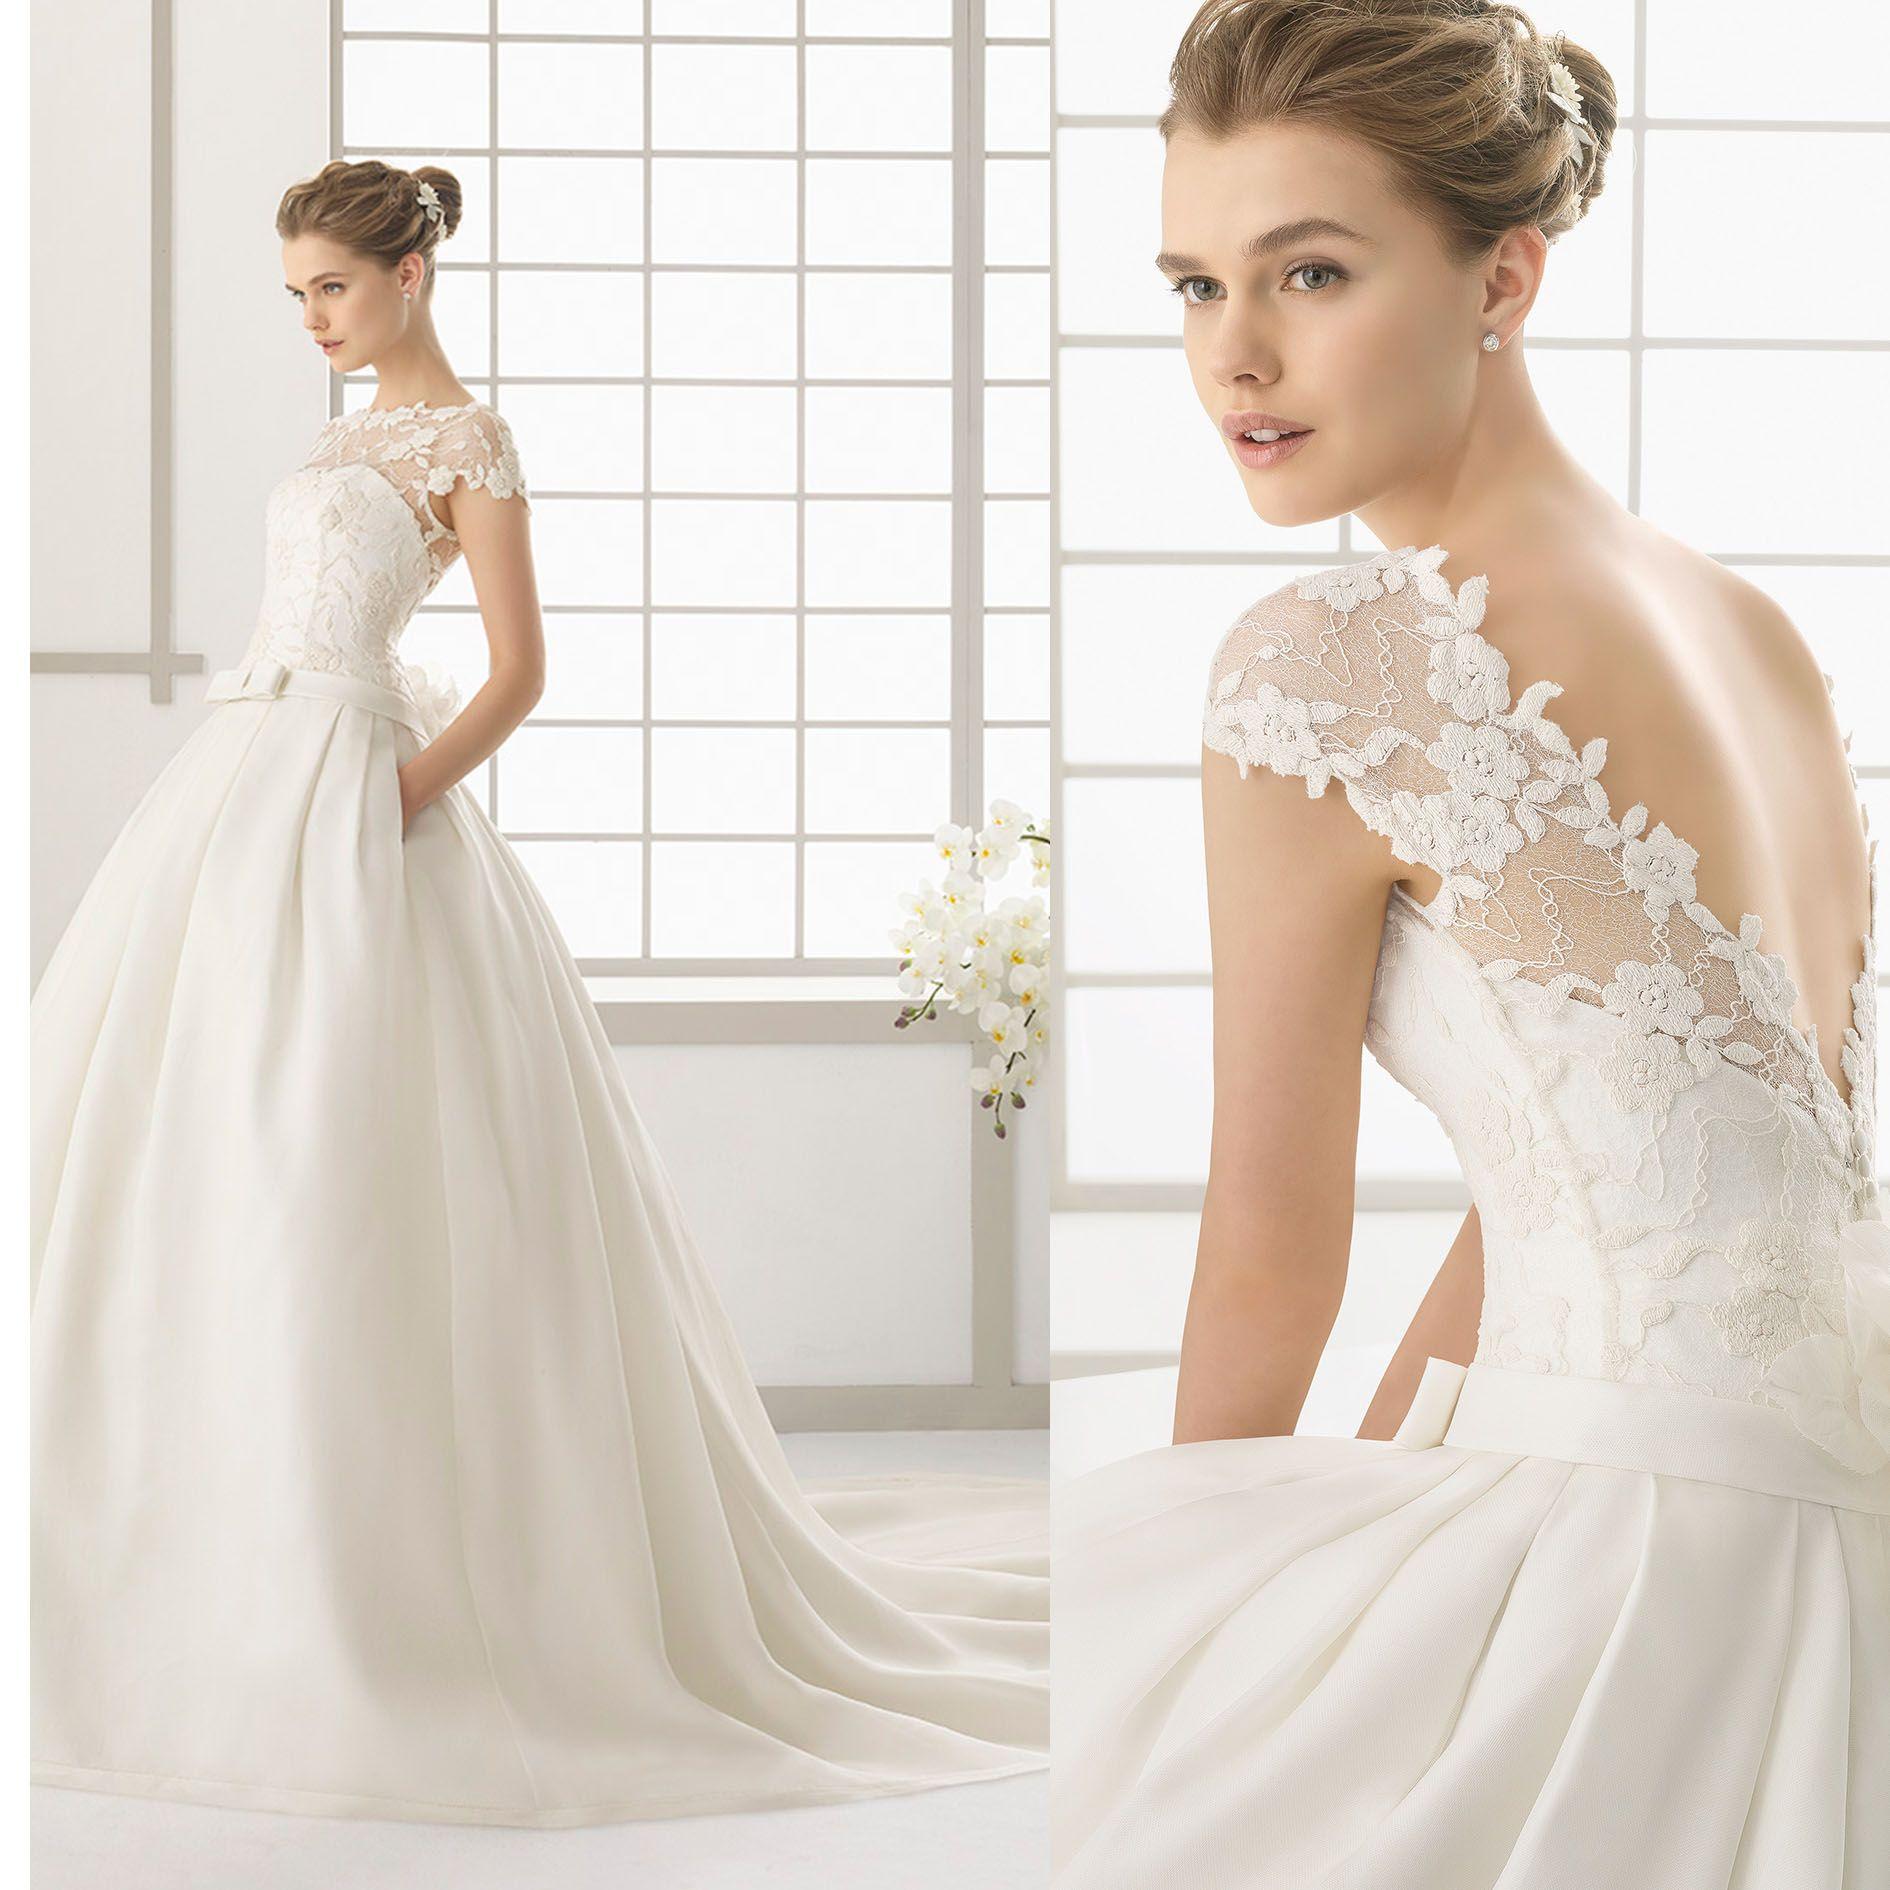 191d78cdd309 2016 new rose clara wedding dresses lace bateau neck short sleeves